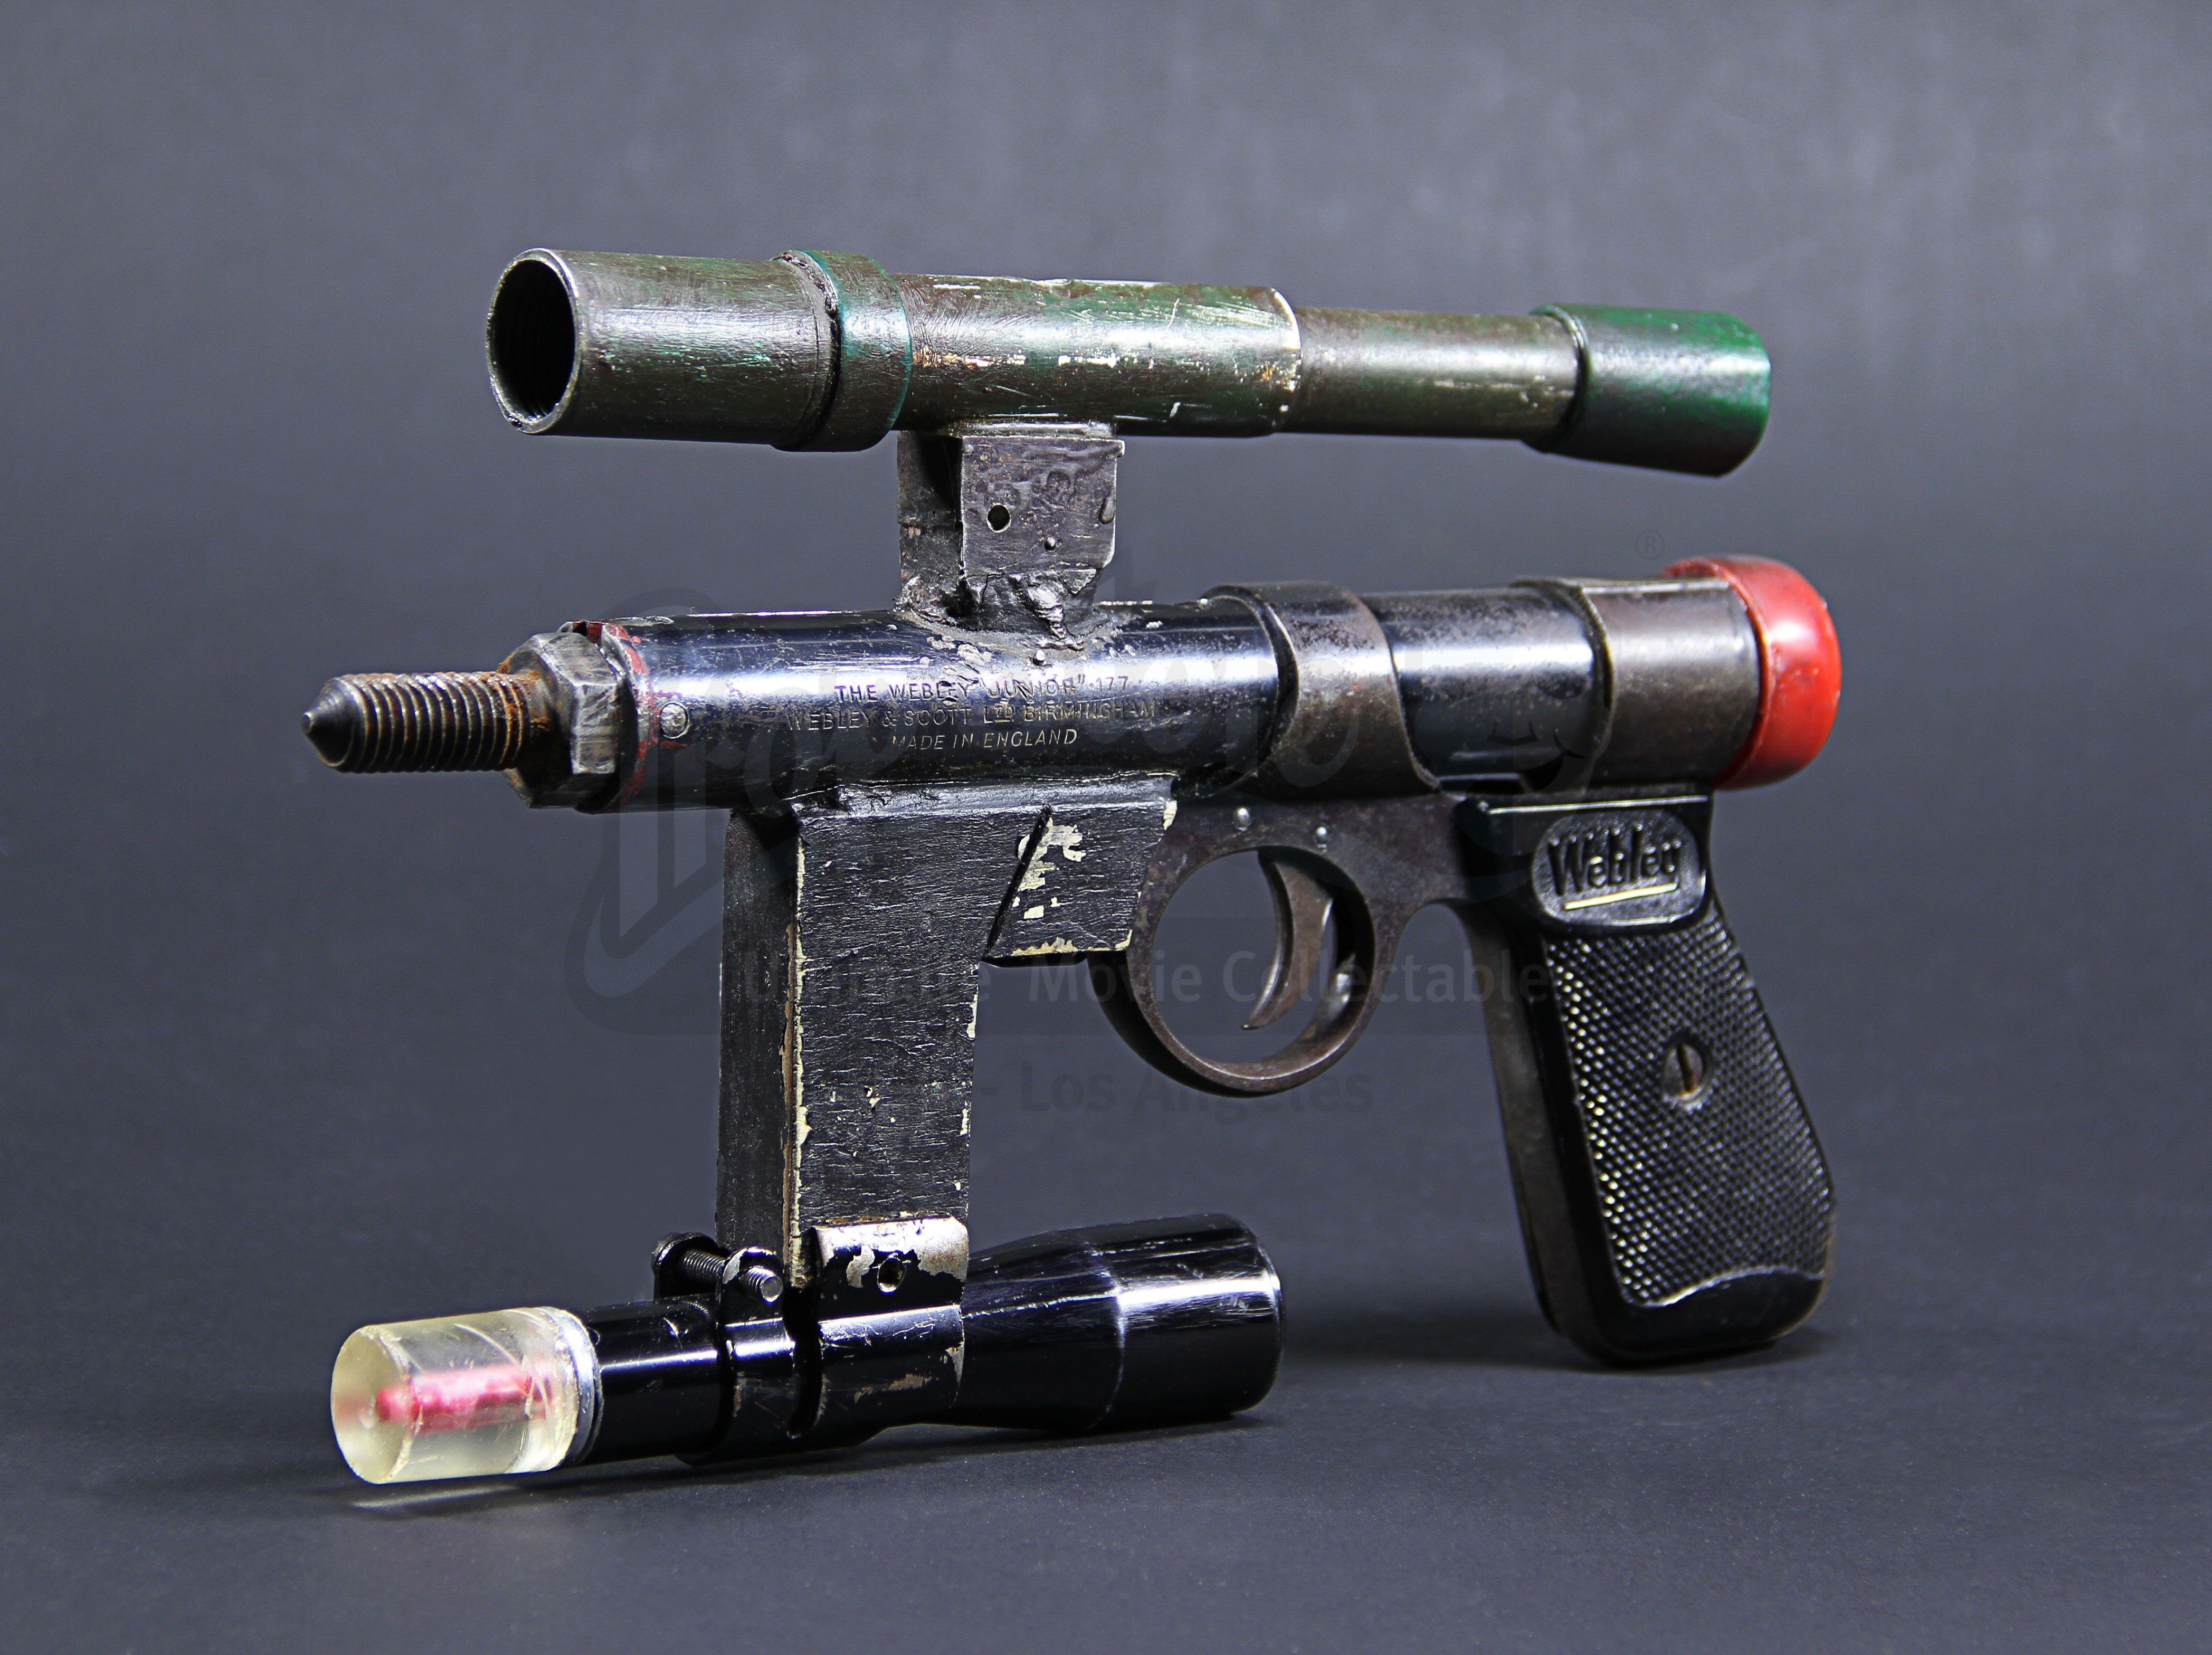 Lot 10 nostromo laser pistol from alien estimate 3000